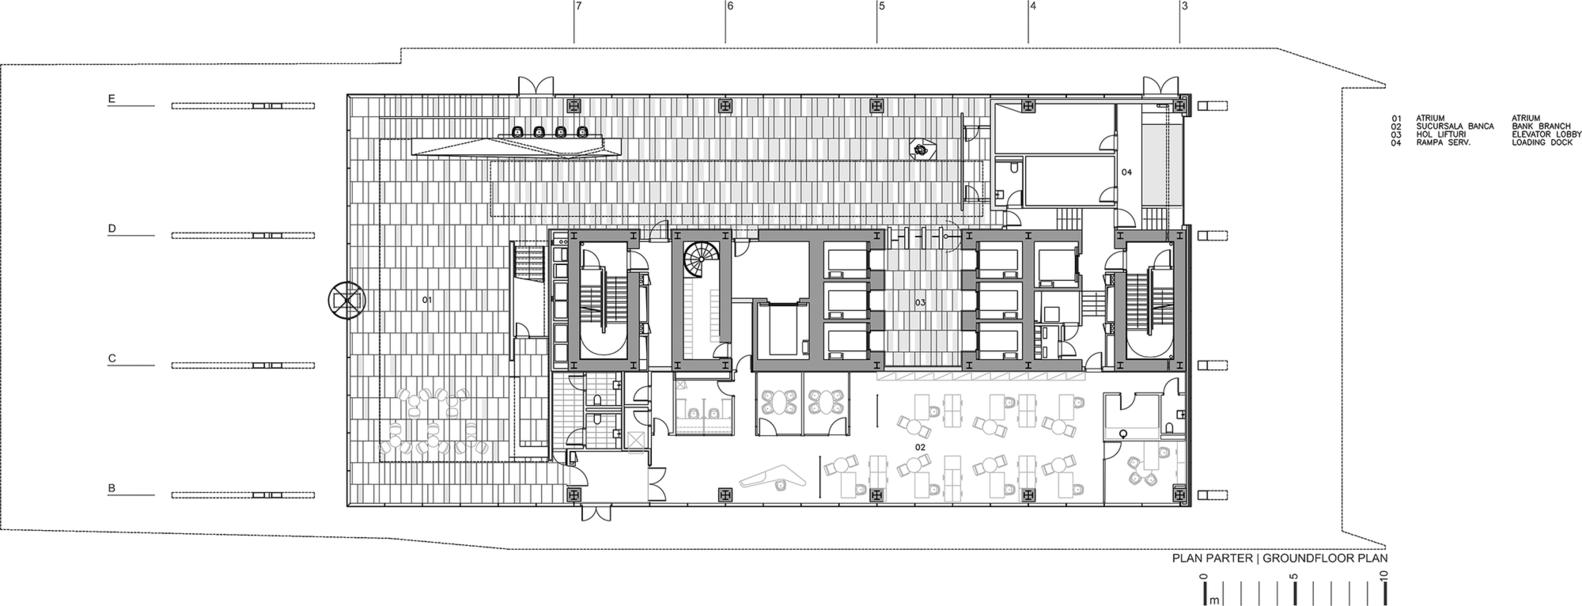 Gallery Of Unicredit ţiriac Bank Hq Westfourth Architecture 22